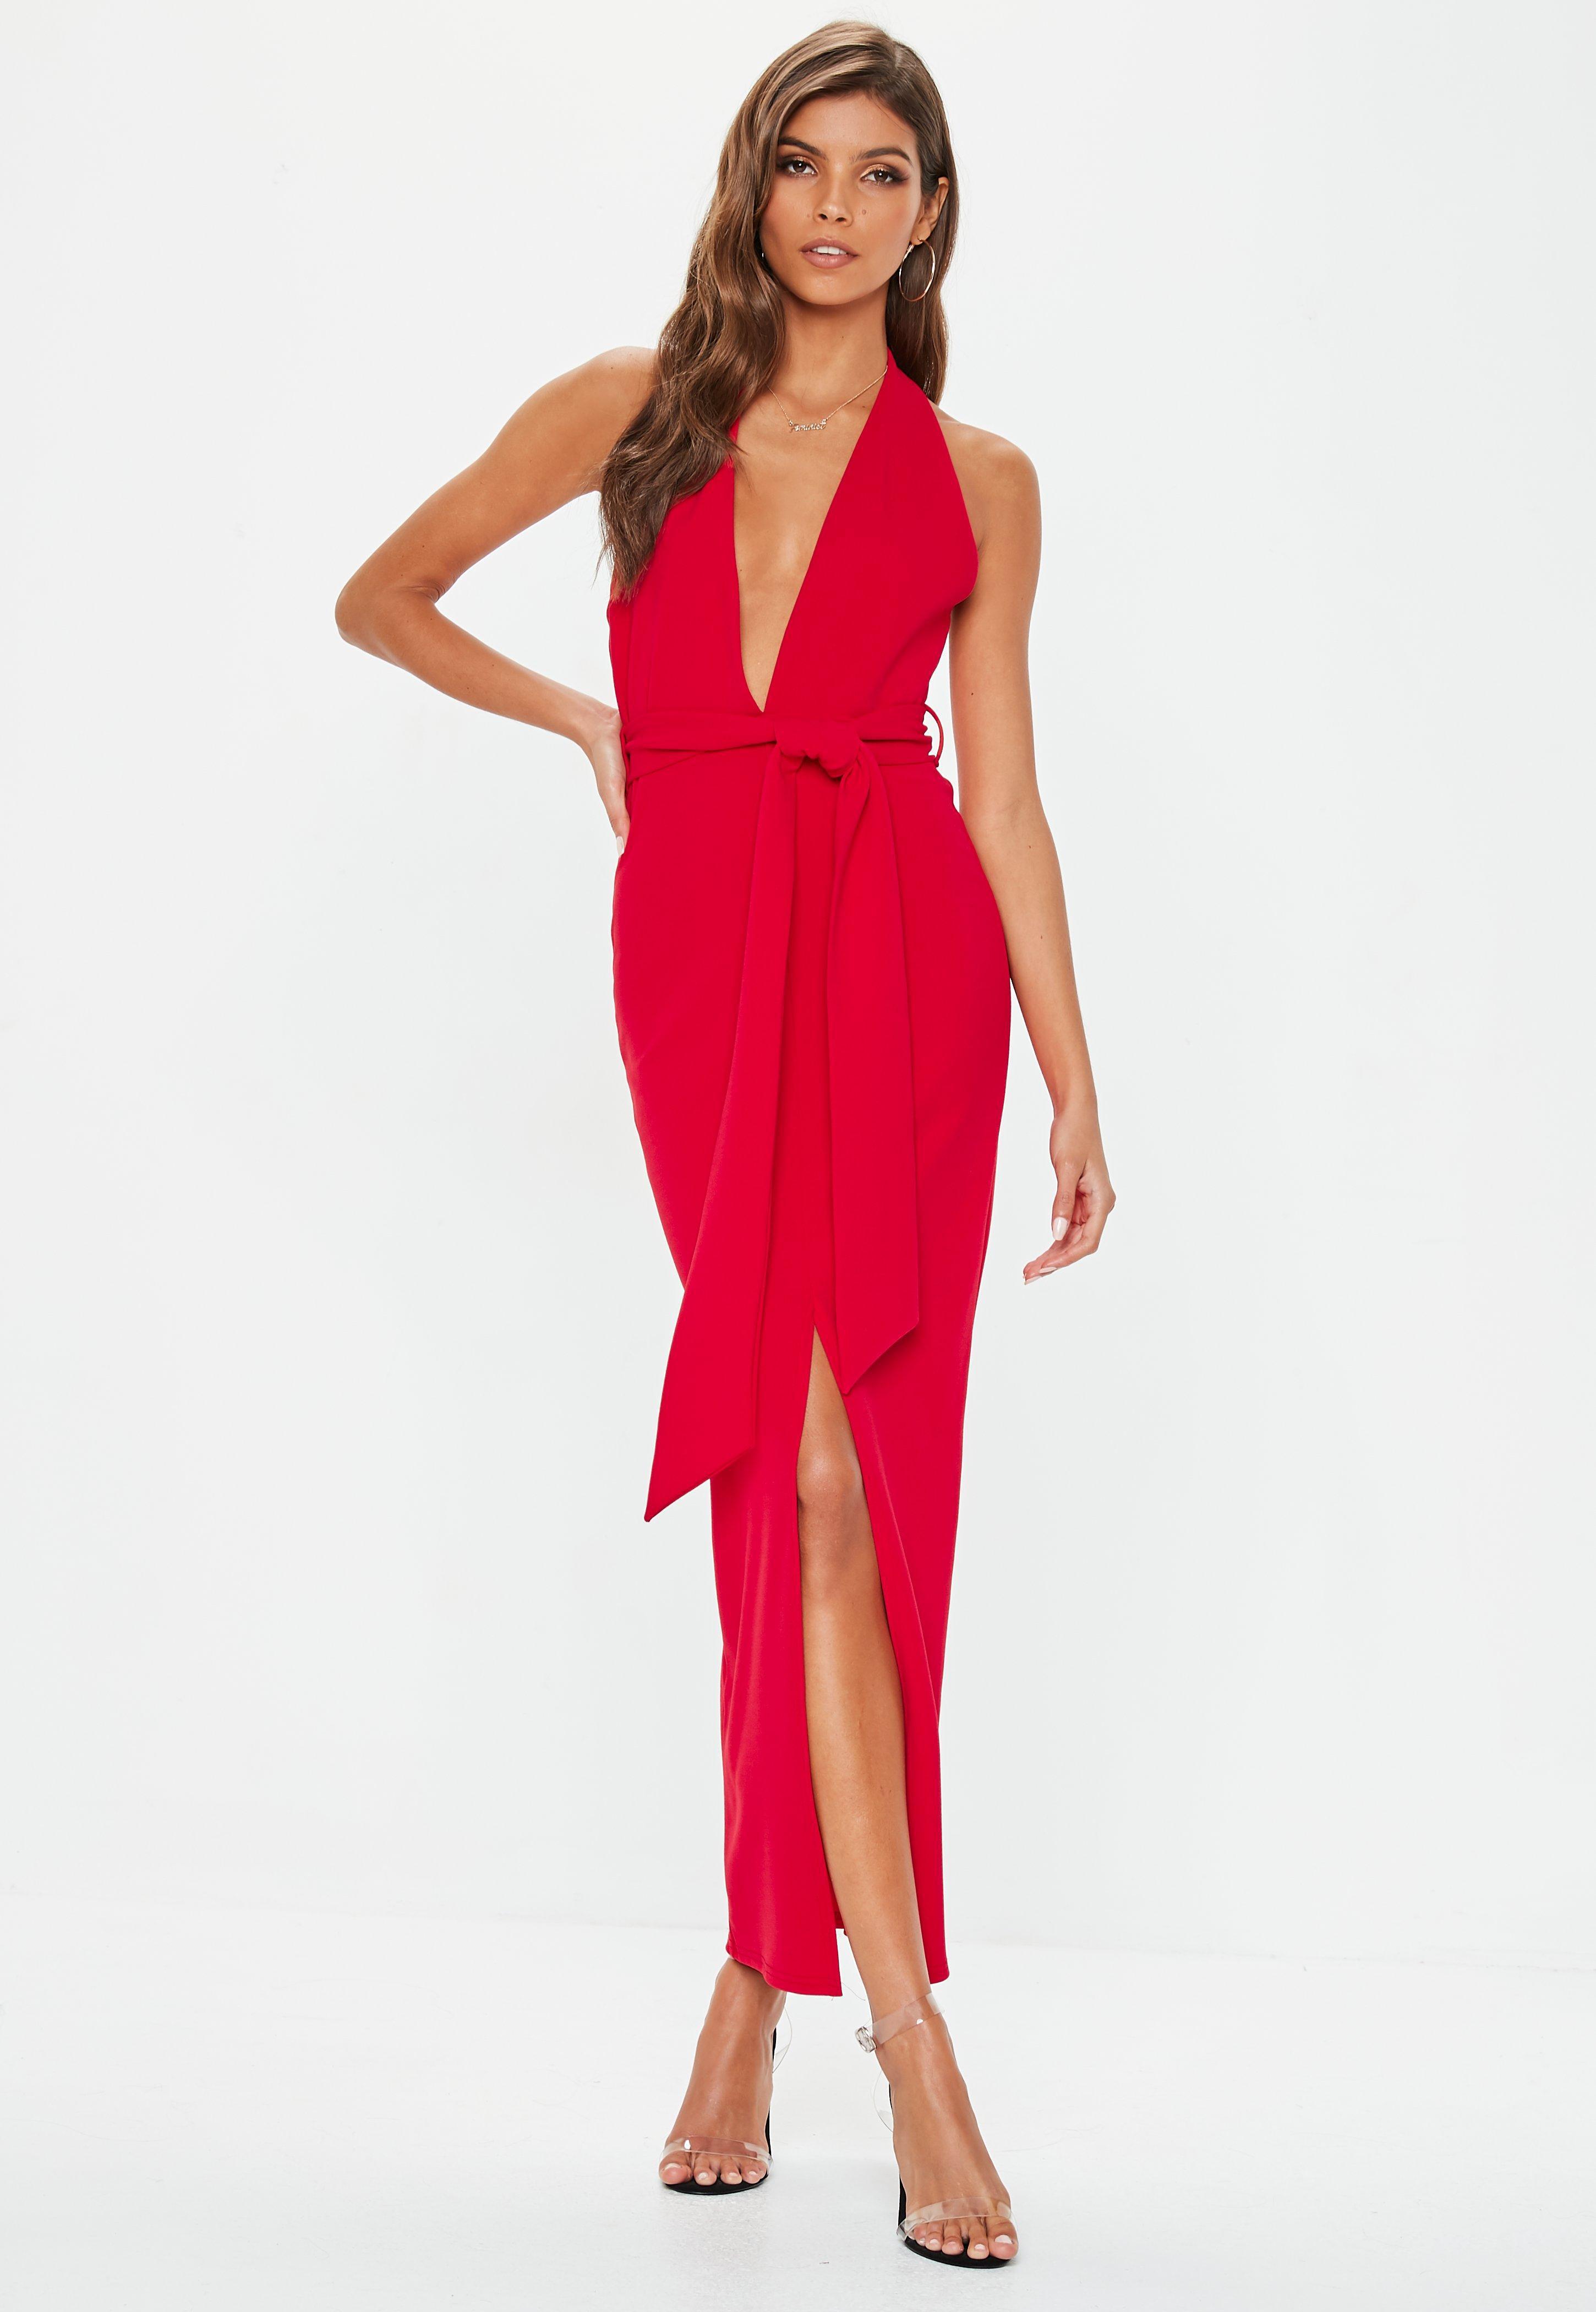 993bb86d32 Lyst - Missguided Red Plunge Tie Waist Midaxi Dress in Red